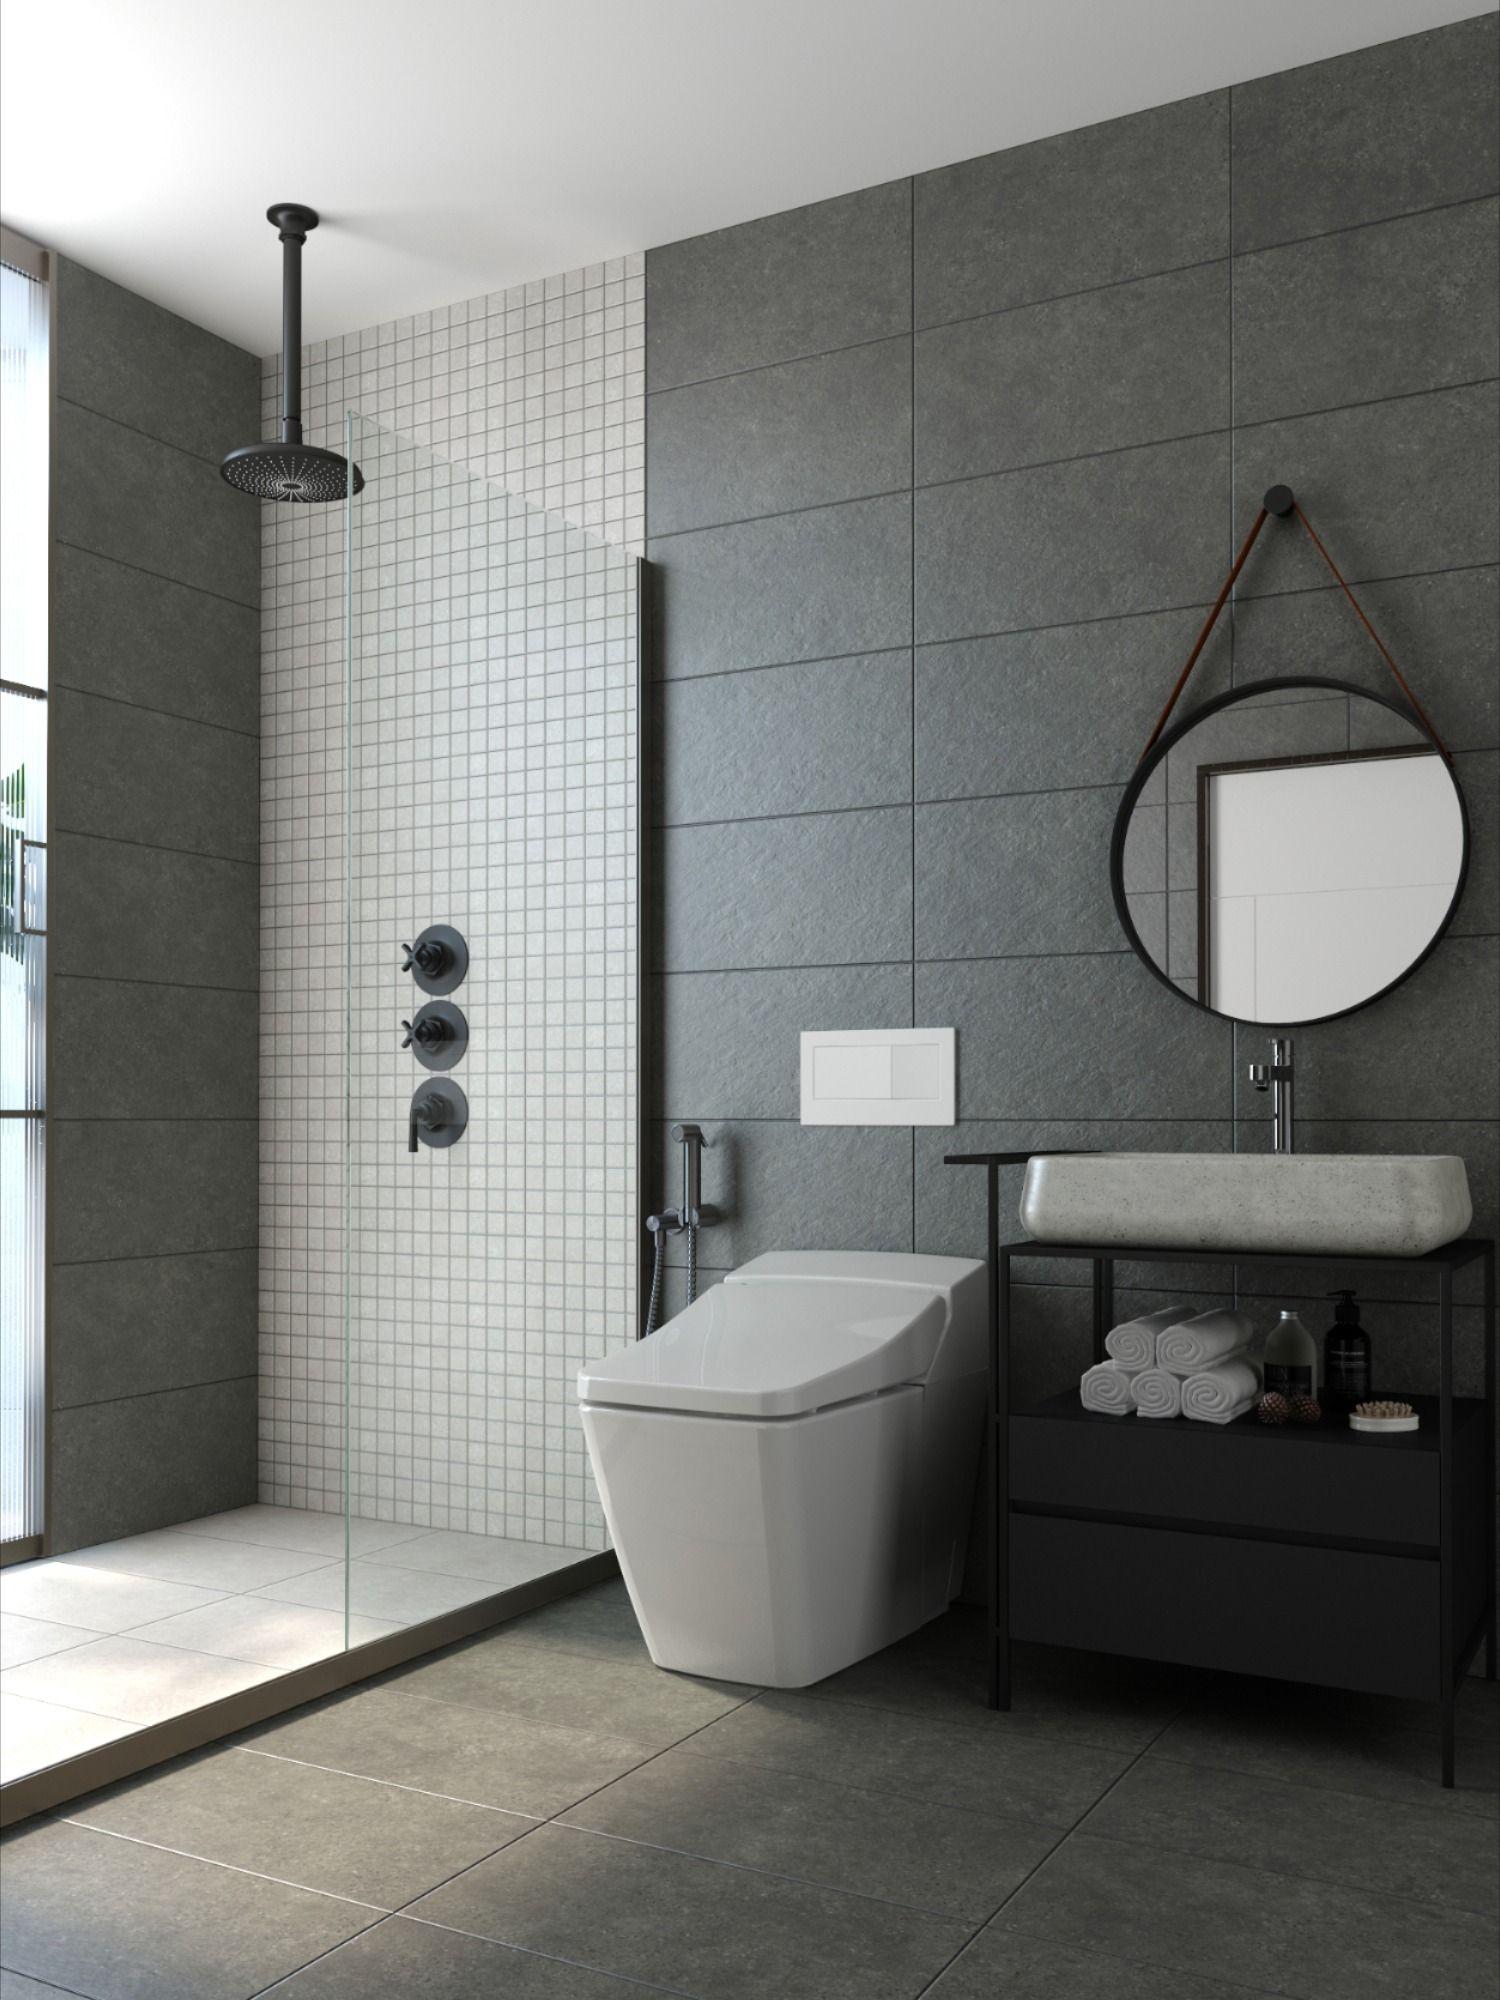 Fused Bathroom Matching Gray Bathroom Decor Washroom Tiles Design Porcelain Tile Bathroom Modern gray bathroom decor